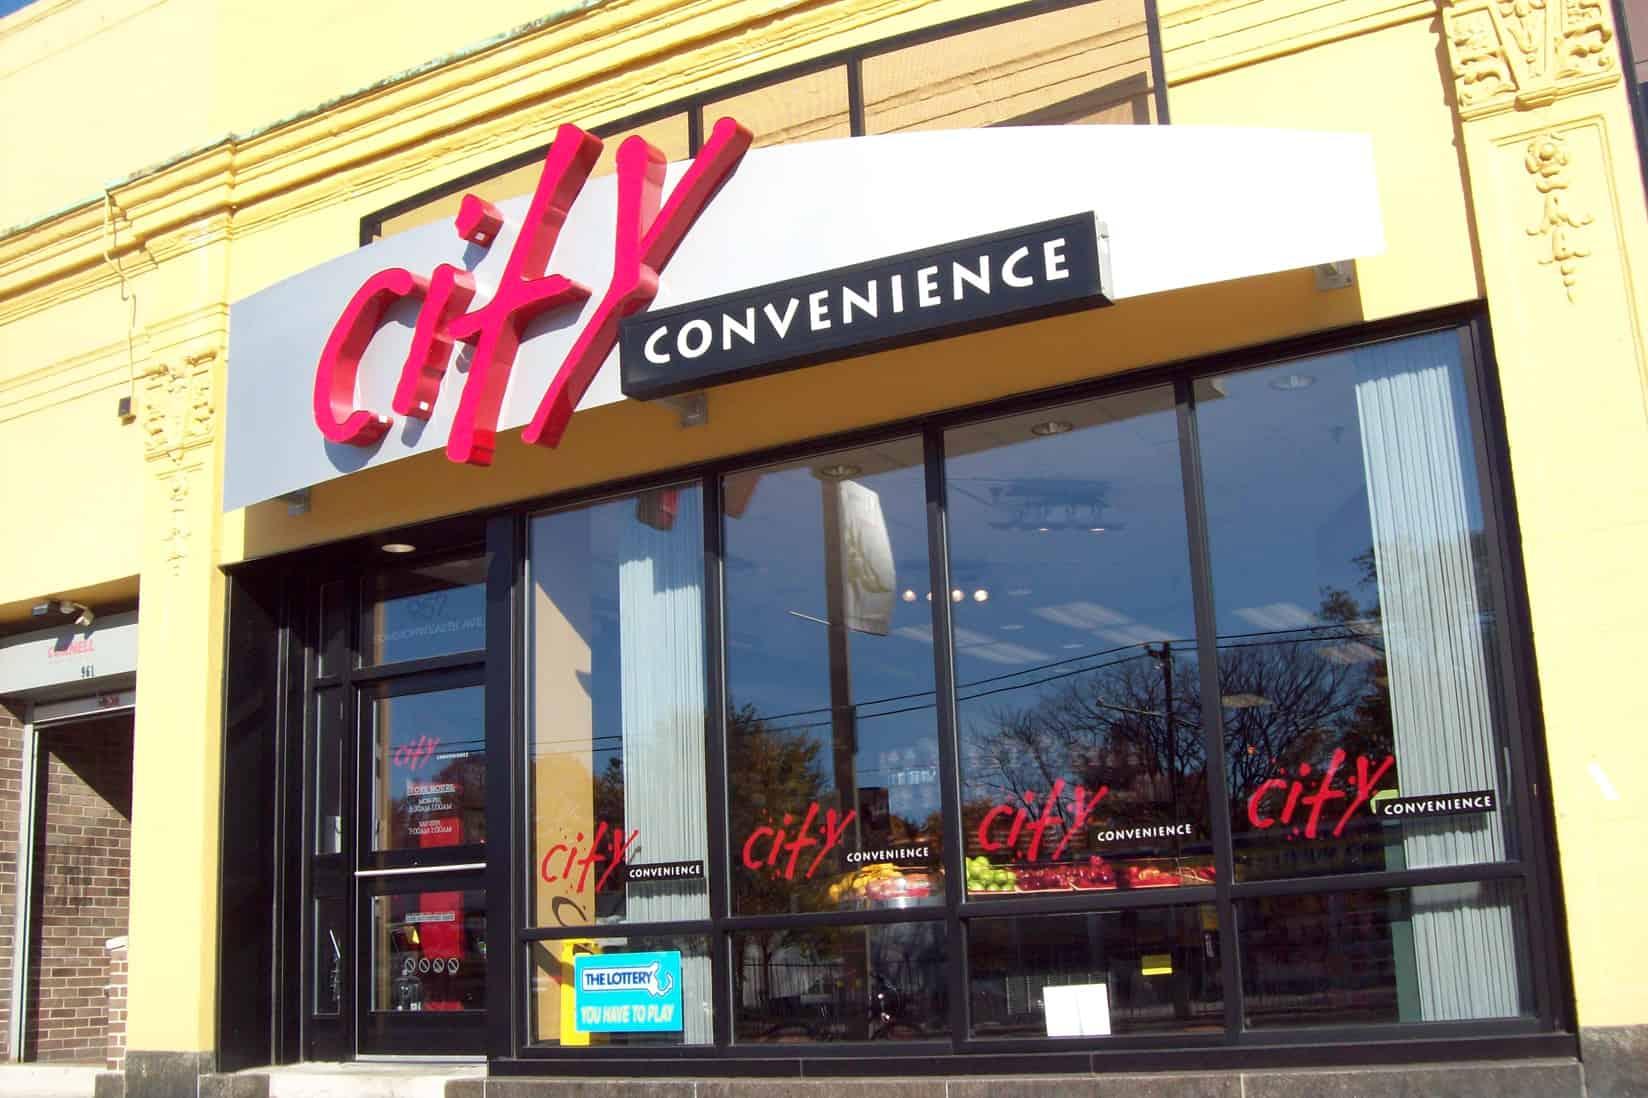 City Convenience 8